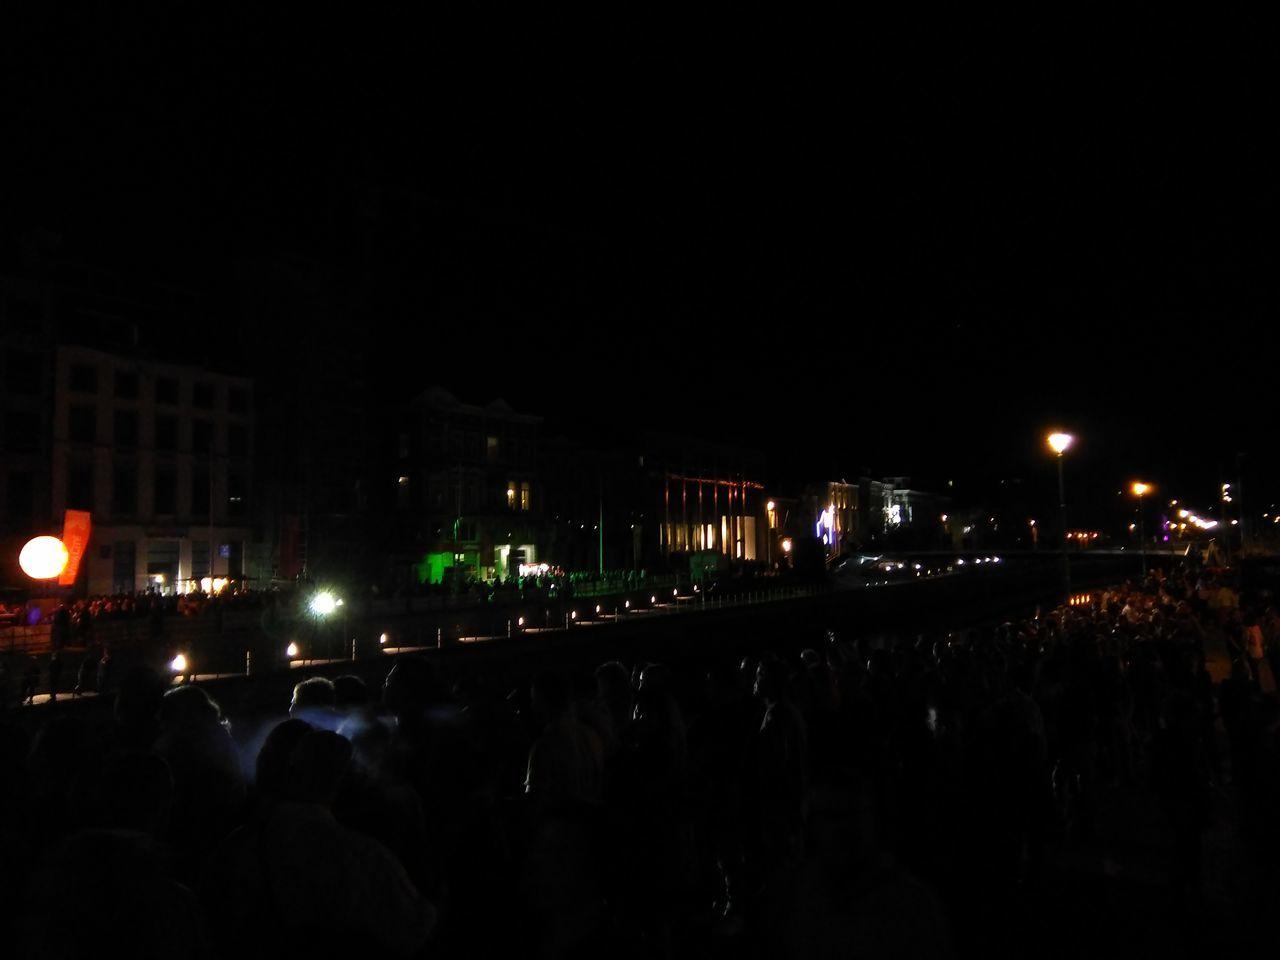 Battle Of The Cities Charleroi, Belgium Illuminated Night City Dark Tourism Vacations Nightlife Outdoors City Life Soir Ville Charleroistreetart City Streetphotography Soirée Lifestyles Belgium. Belgique. Belgie. Belgien. Etc.